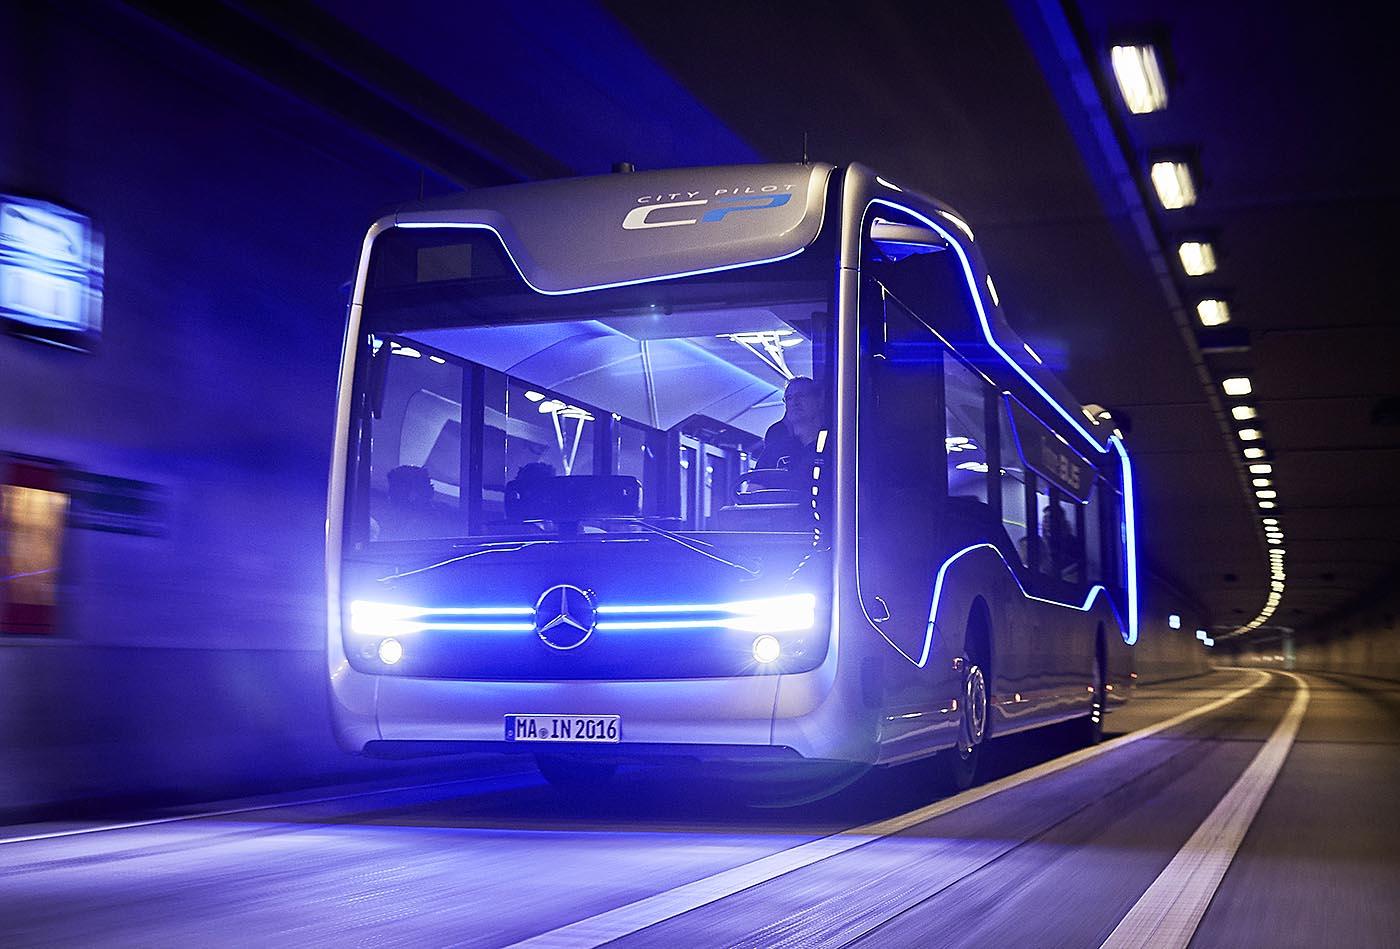 Mercedes ya prueba sus autobuses autónomos en Amsterdam